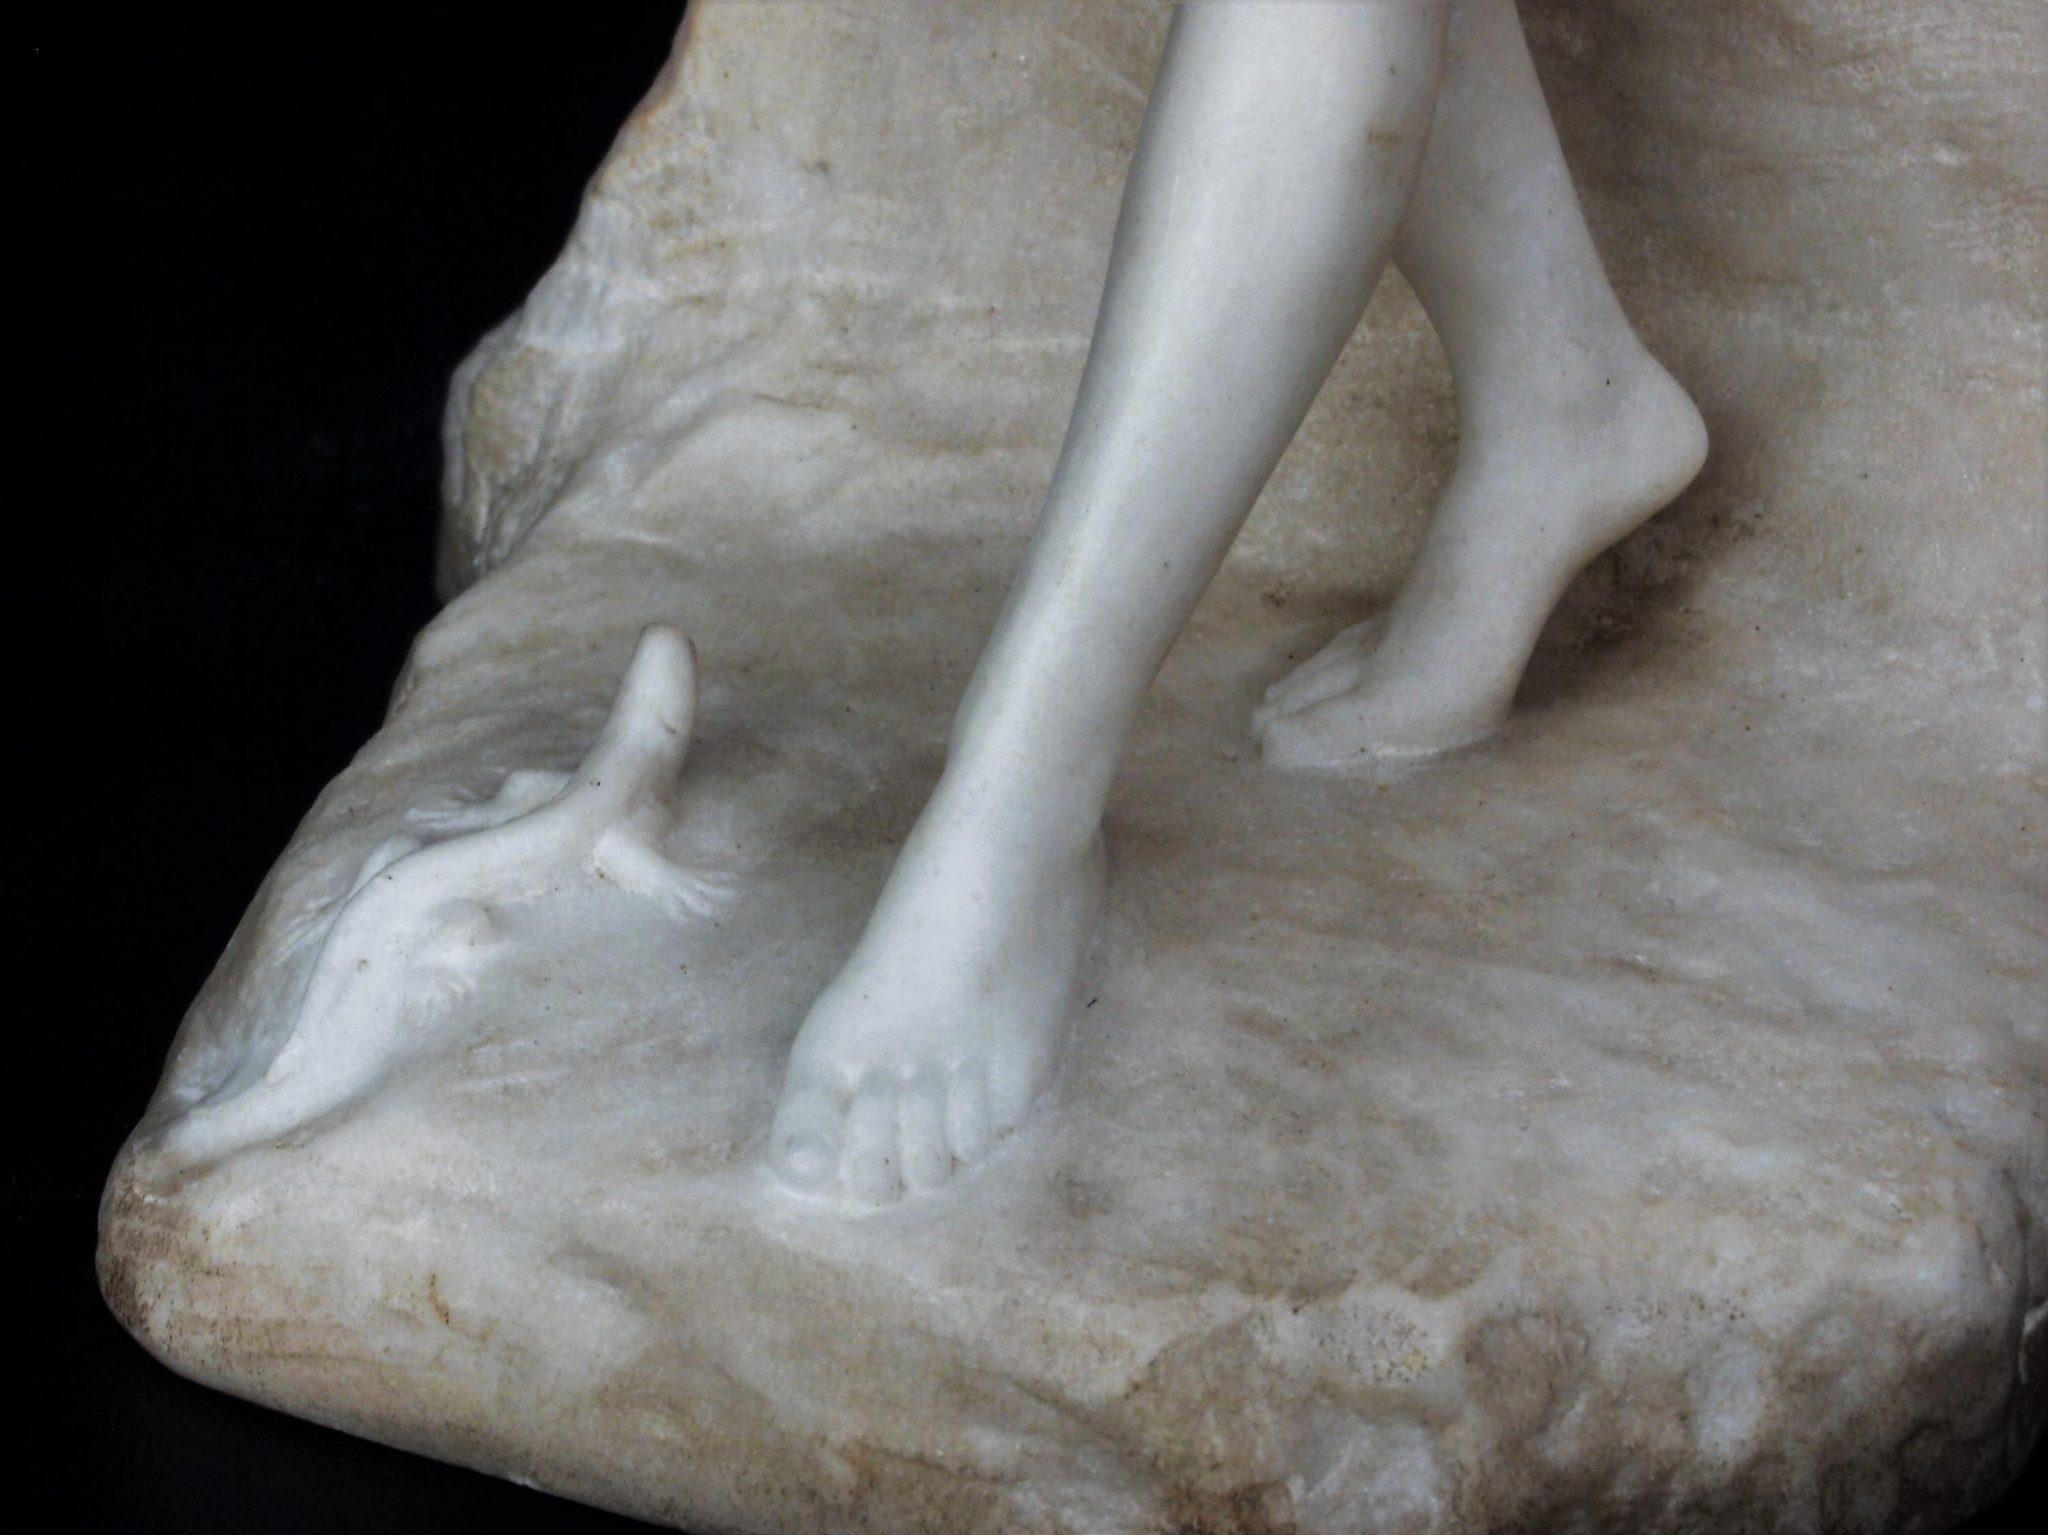 Lot - J. Langford Signed Carrara Marble Nude Sculpture